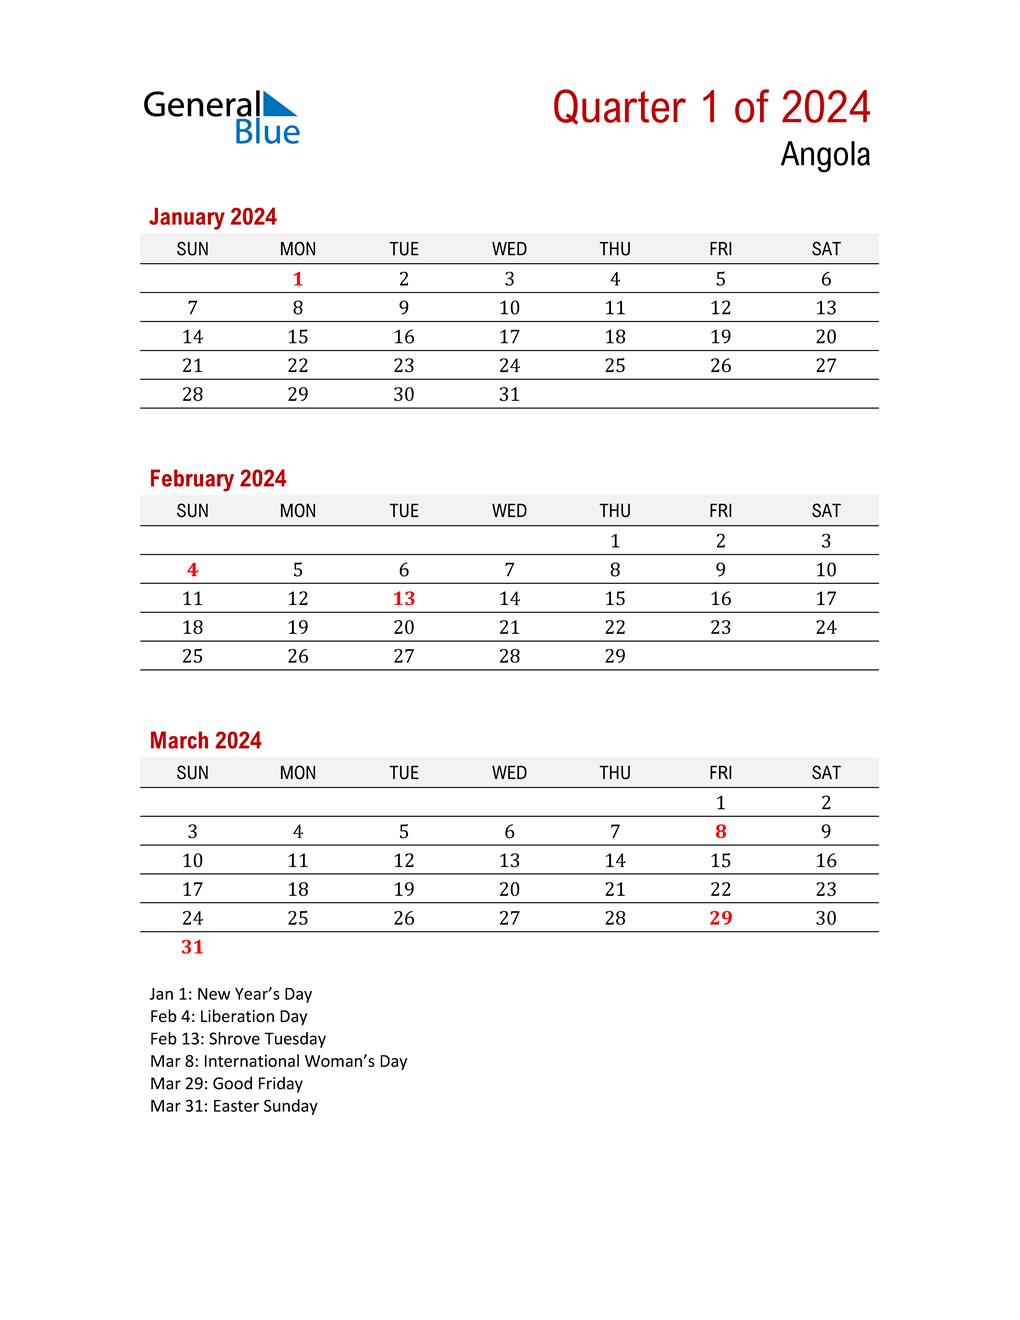 Printable Three Month Calendar for Angola